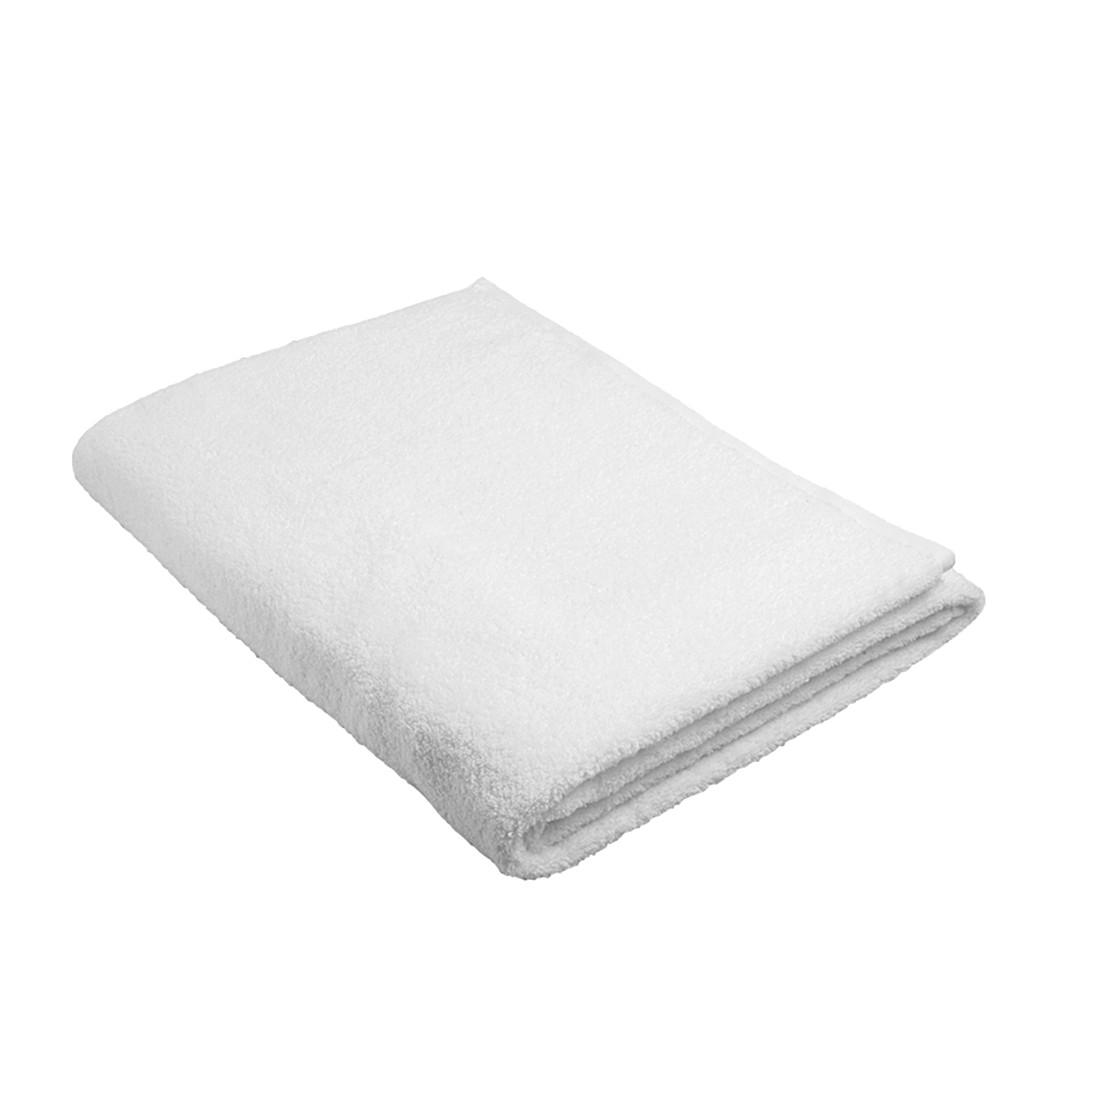 Home 24 - Serviette de sauna pure - 100 % coton - blanc, stilana